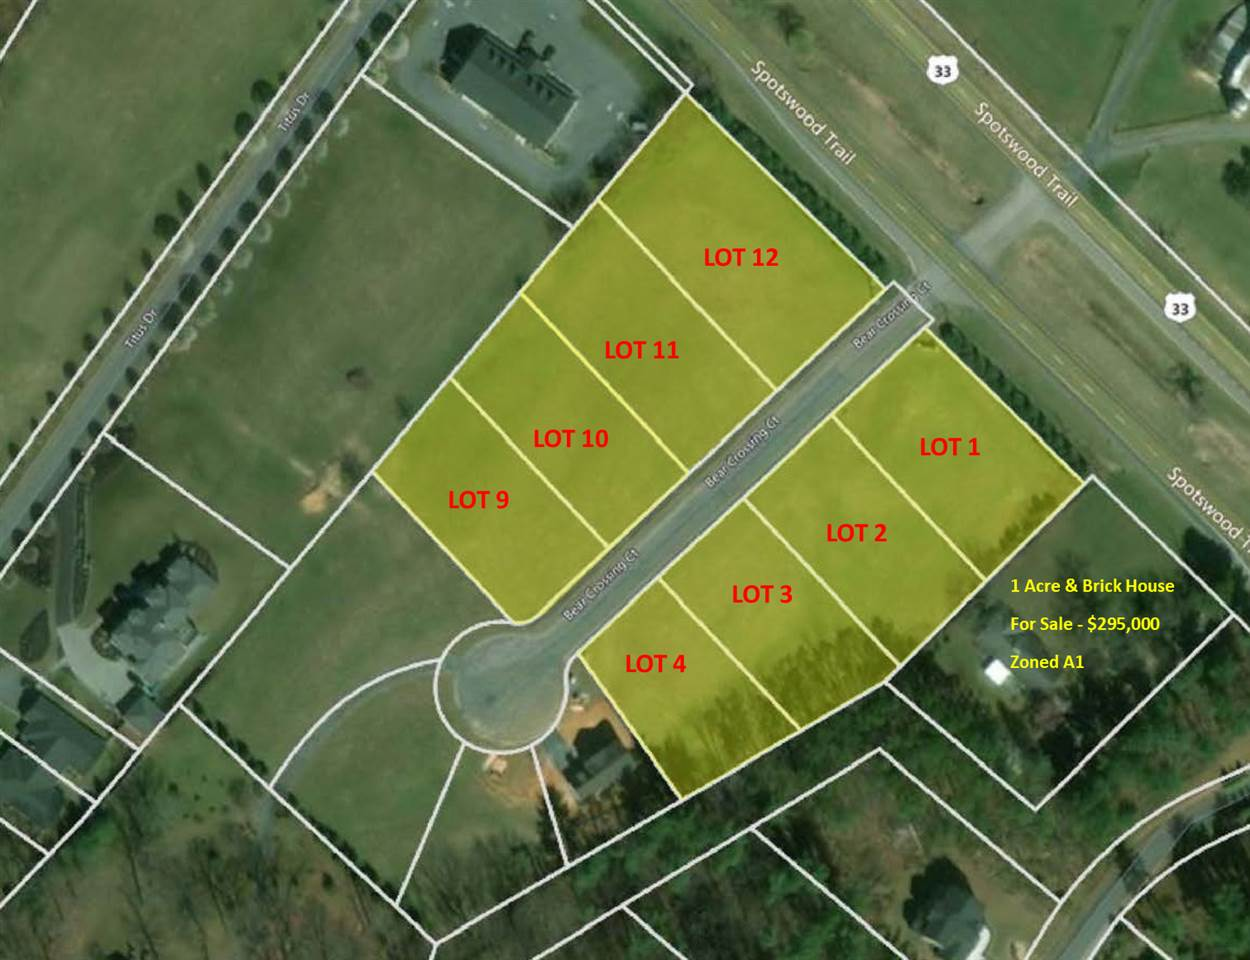 Lot 9 BEAR CROSSING CT, PENN LAIRD, VA 22846